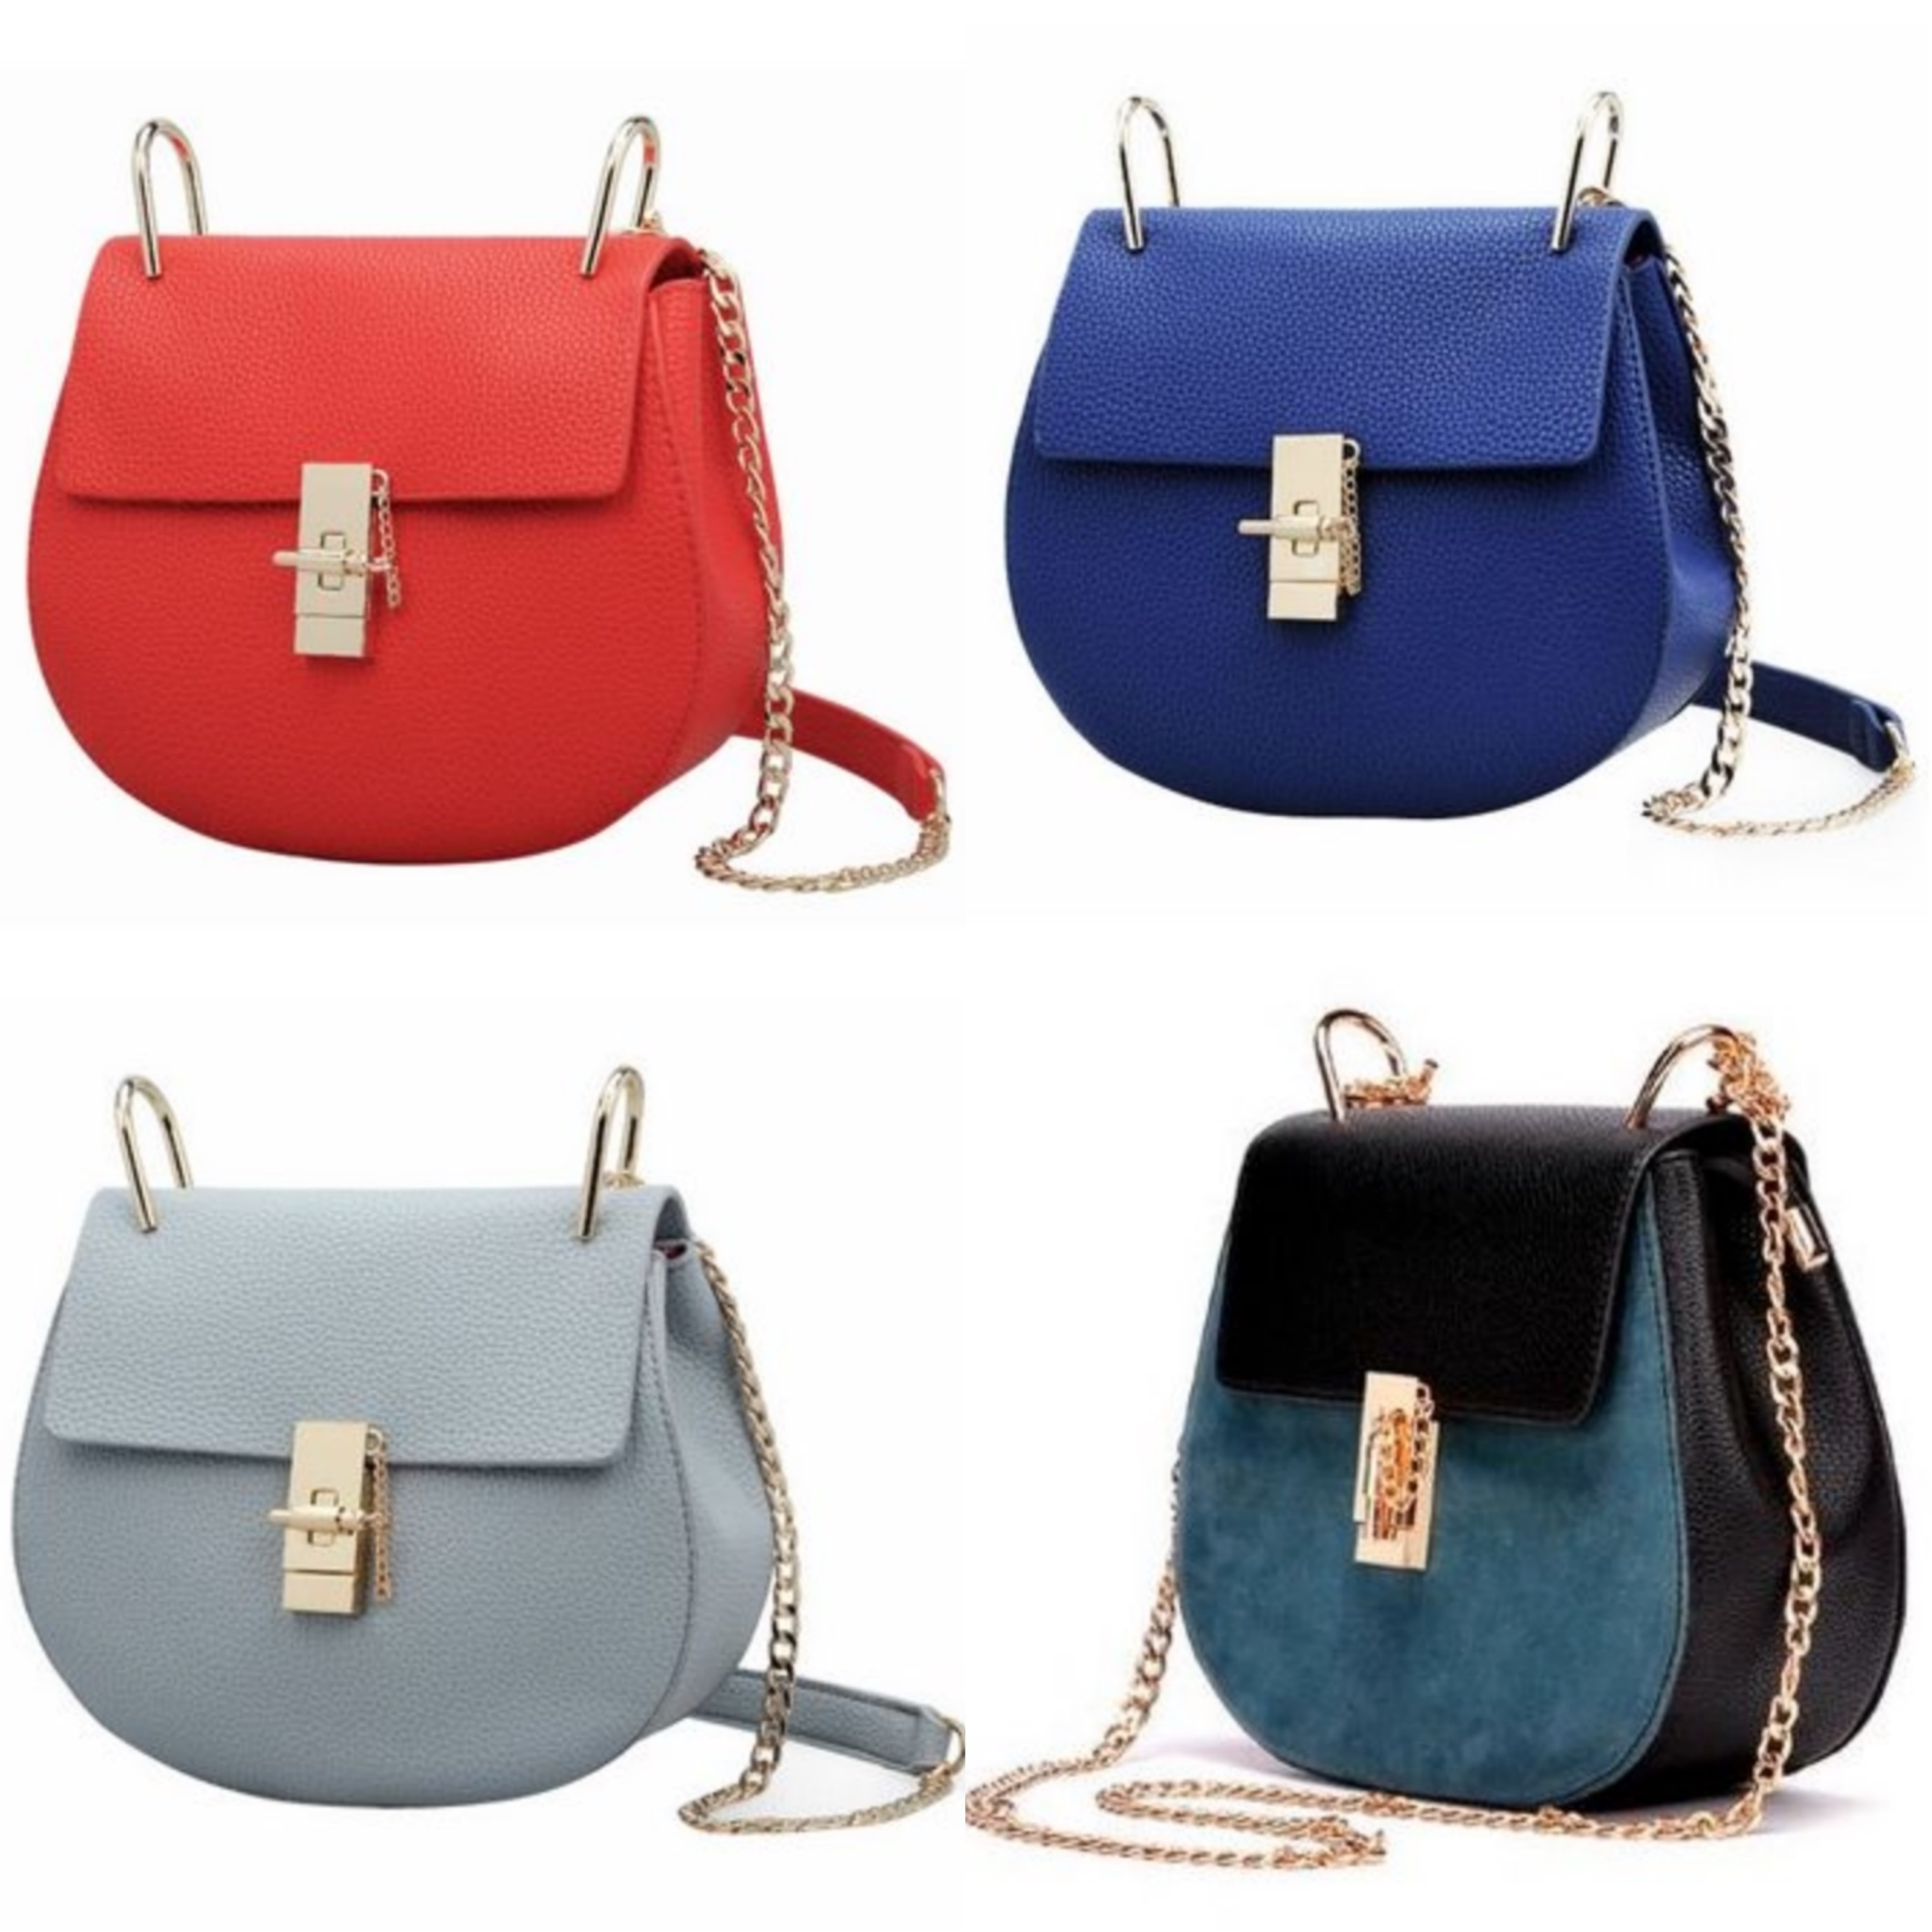 chloe handbags sale online - Deals & Steals: The Chlo�� ��Drew�� Crossbody | Areta's Style Secrets